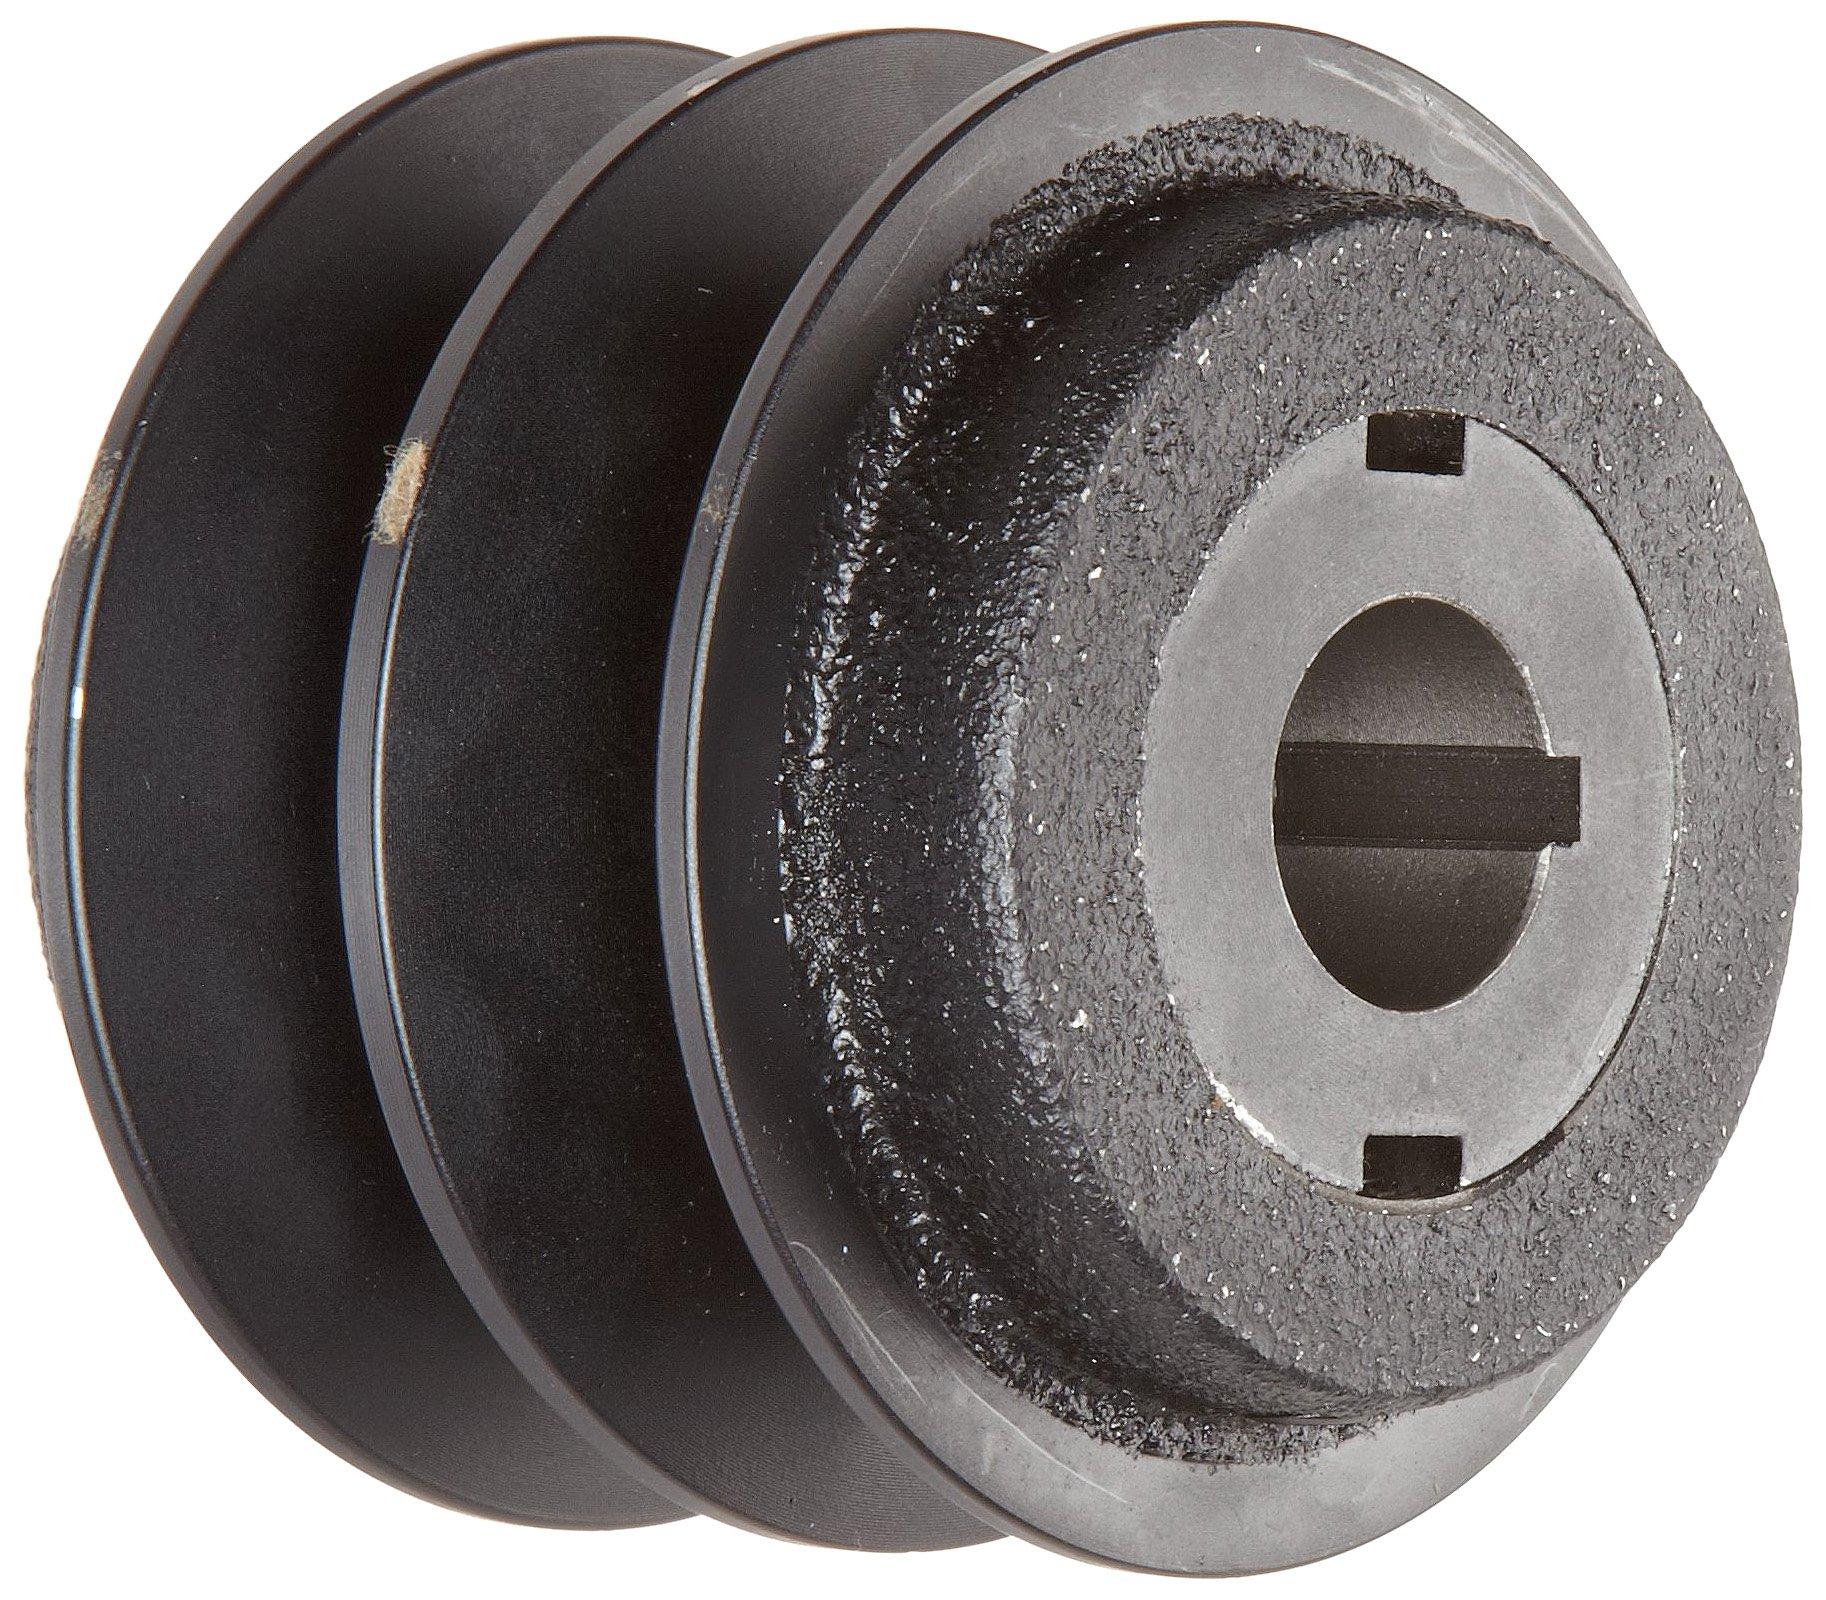 "Martin 2VP56 7/8 VP Sheave, 3L/4L/5L or A/B Belt Section, 2 Grooves, 7/8"" Bore, Class 30 Gray Cast Iron, 5.35"" OD, 4637 max rpm, 4.0-4.8"" Pitch Diameter/4.1-5.1 Datum/4.2-5.2 Datum"